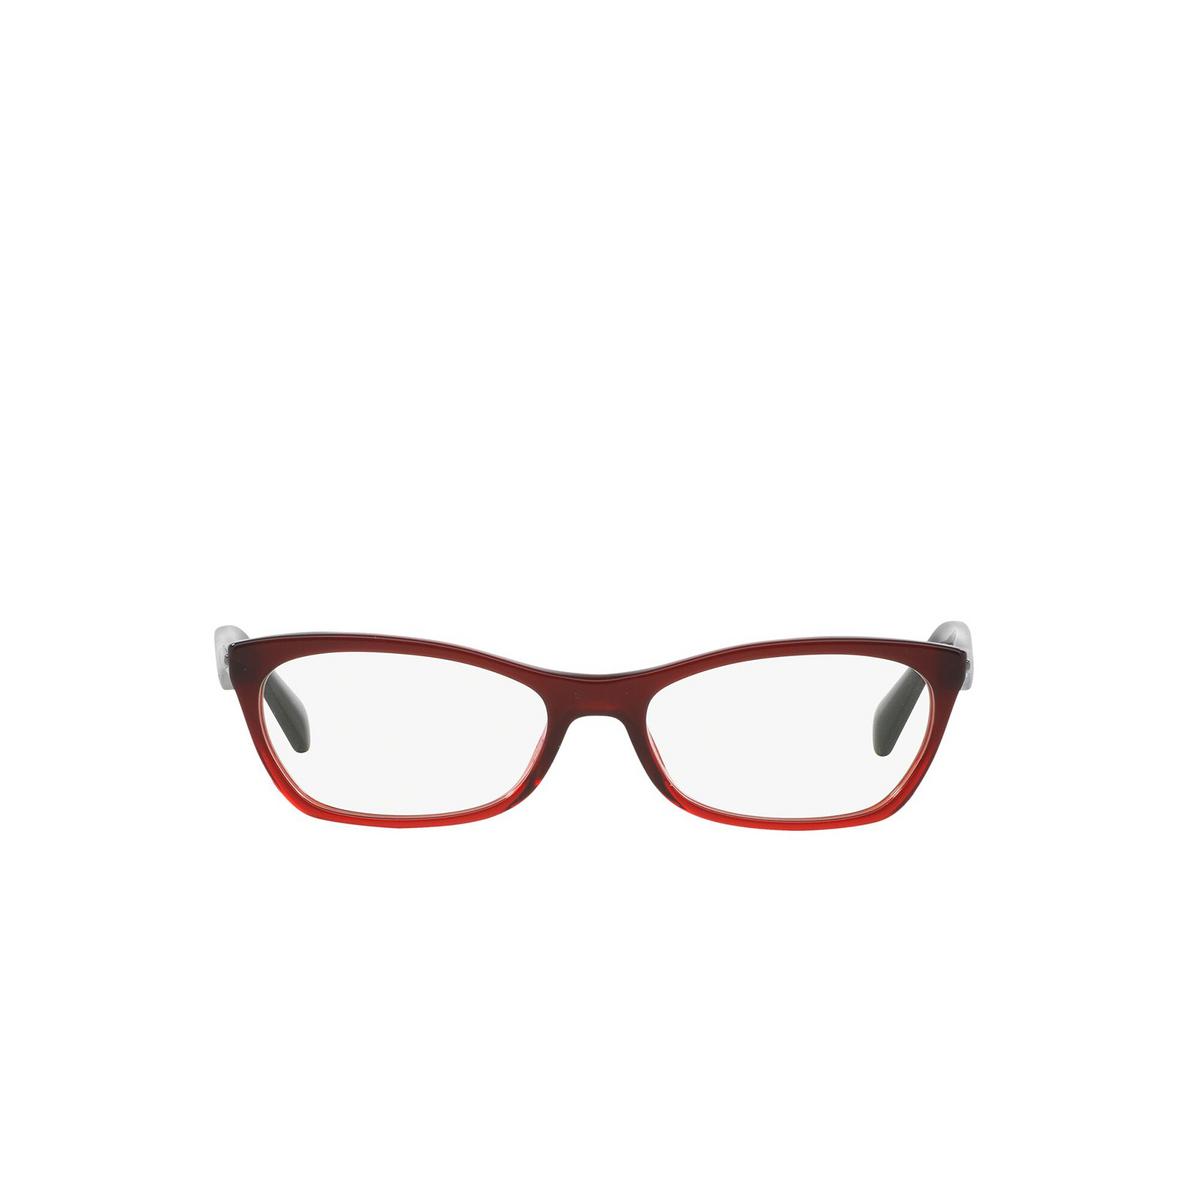 Prada® Cat-eye Eyeglasses: Catwalk PR 15PV color Bordeaux Gradient Red MAX1O1 - front view.